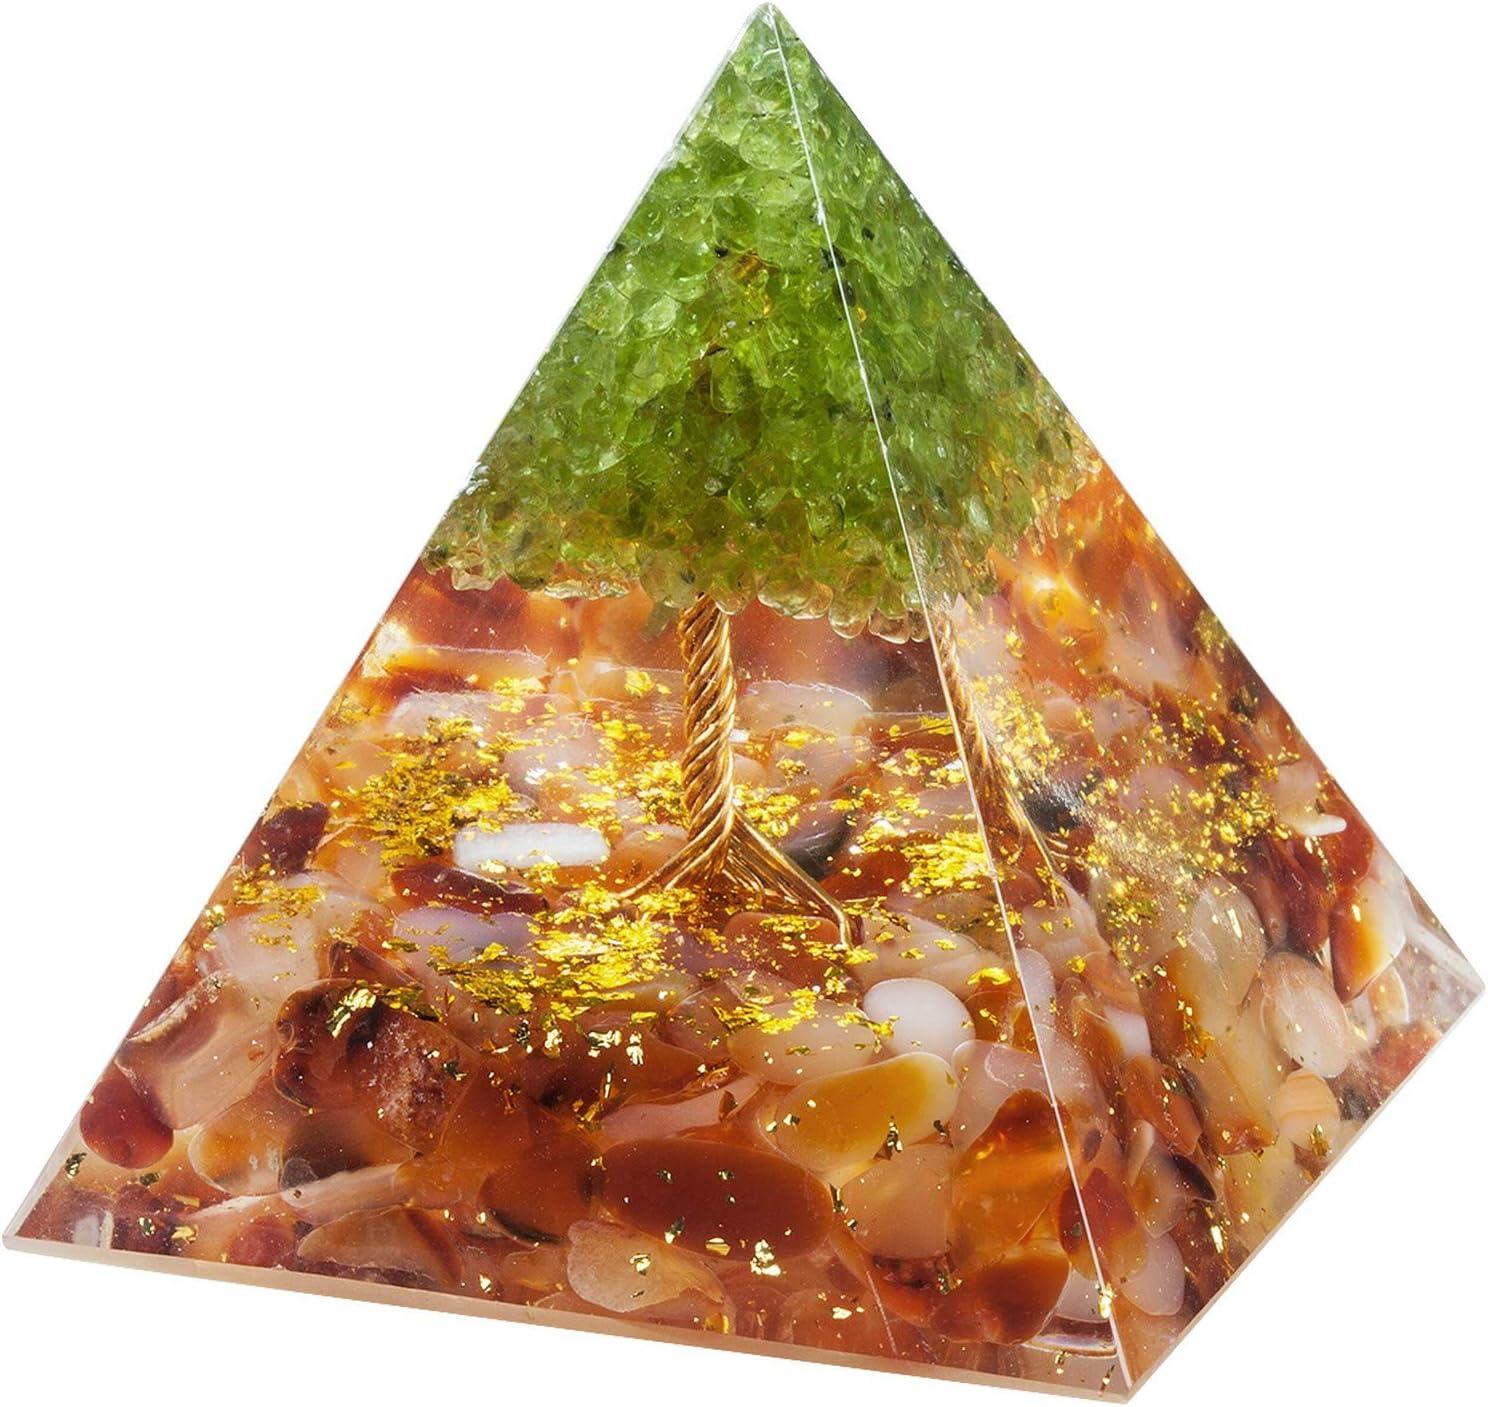 Nupuyai Tree of Life Peridot and Carnelian Crystal Orgone Pyramid Stone for Protection, Reiki Healing Chakra Meditation Energy Generator for Home Decor